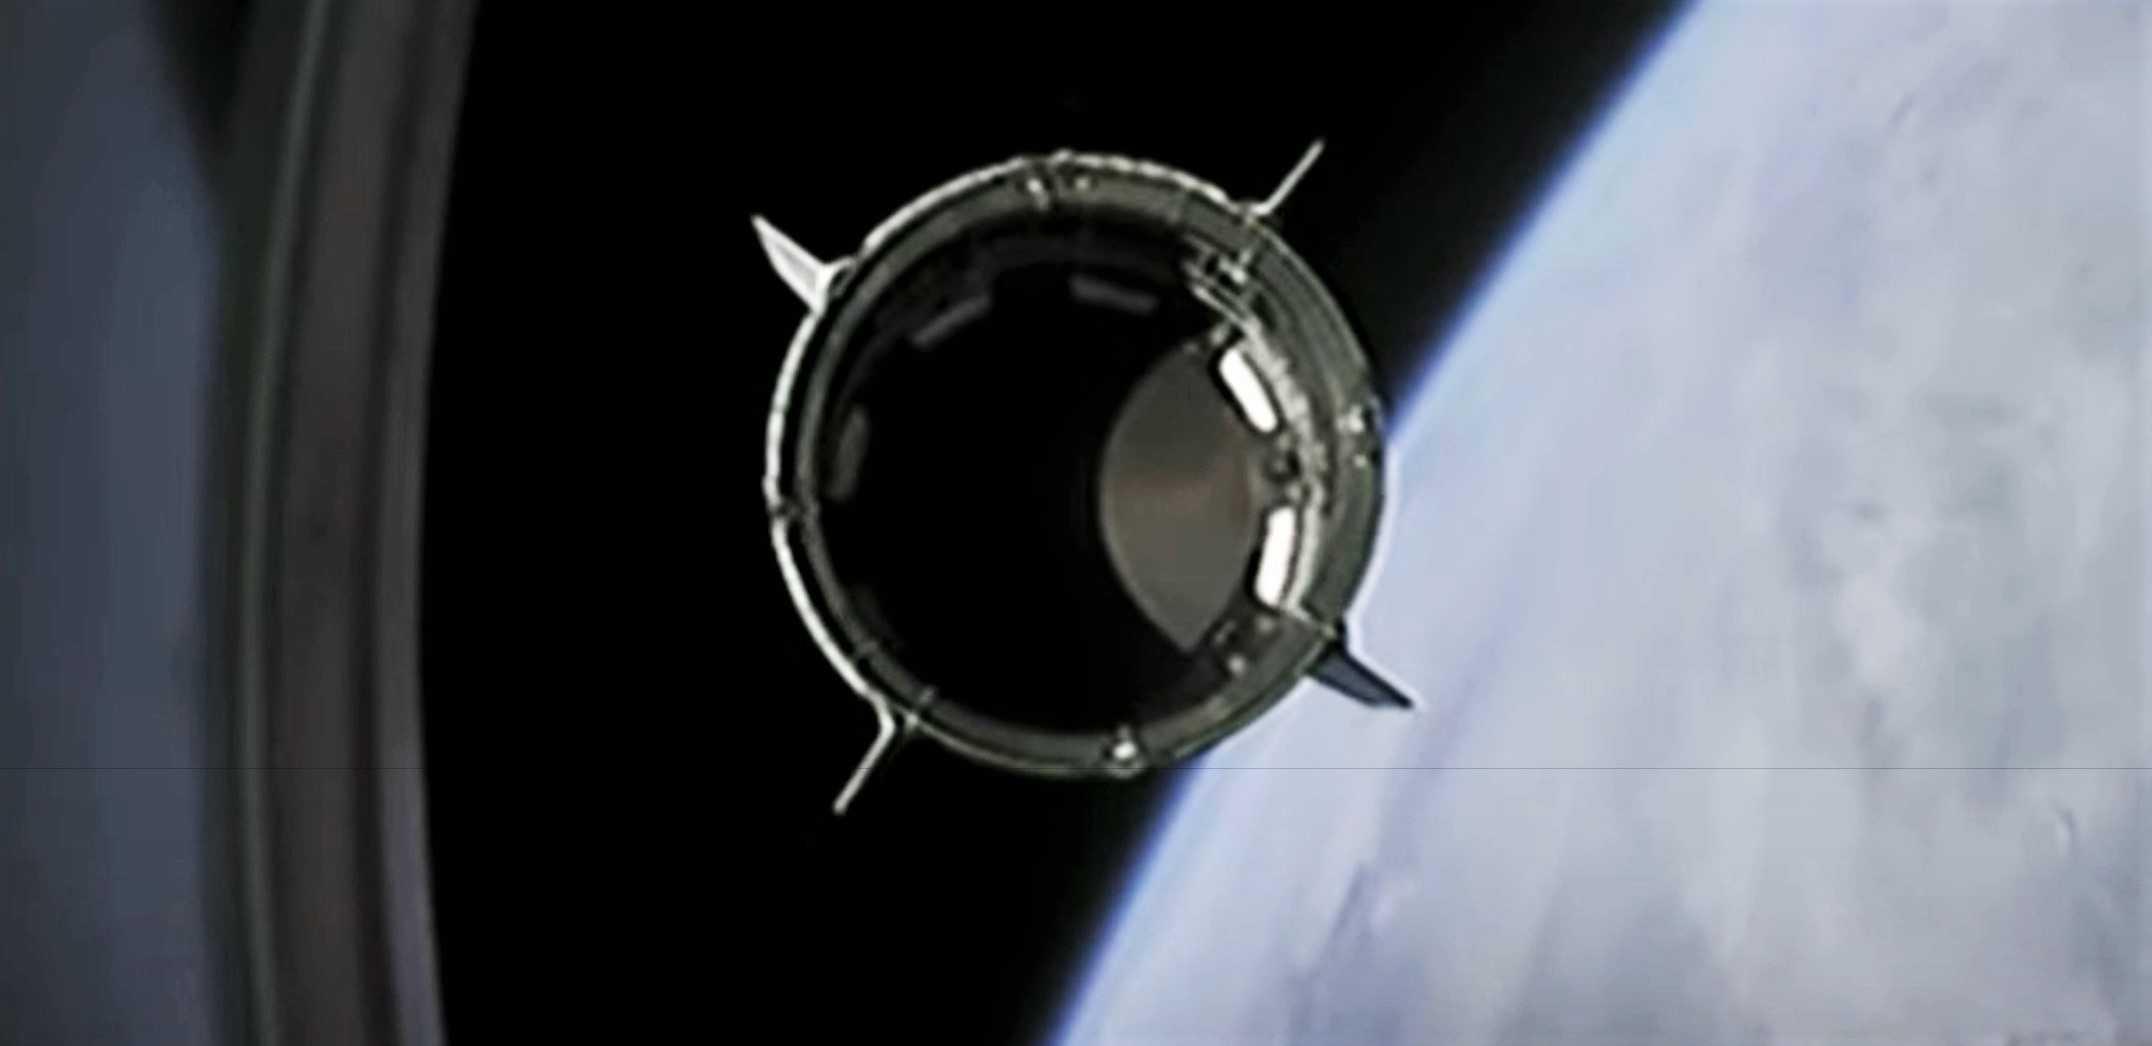 Crew Dragon C206 F9 B1058 Demo-2 053020 webcast (SpaceX) 10 crop (c)